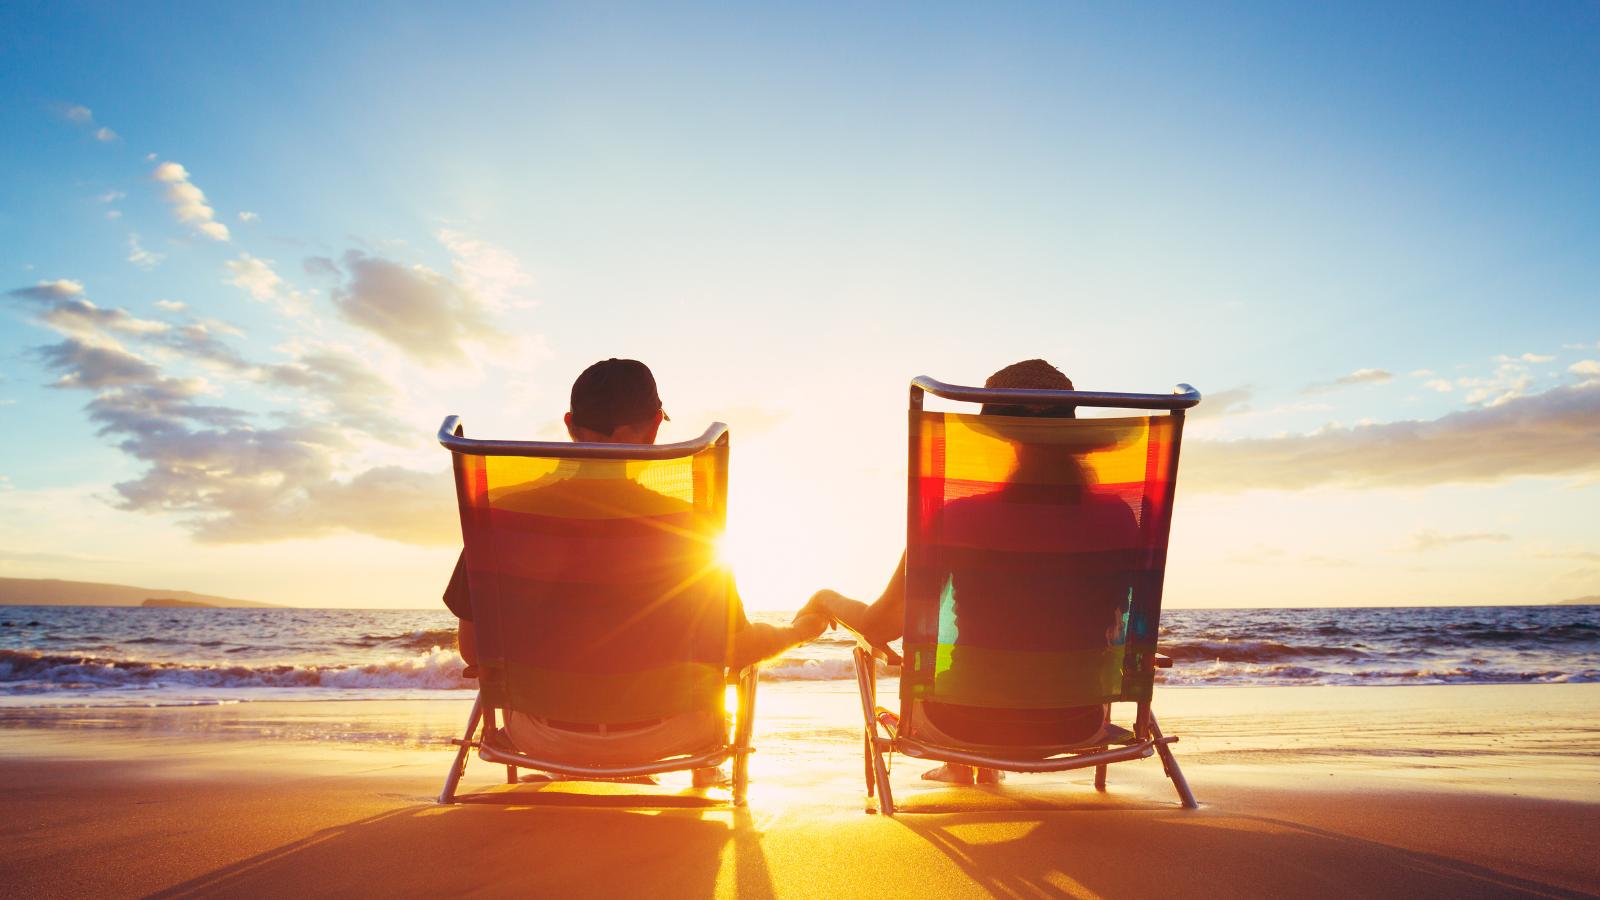 Ready, Set, Retire! A Retirement Age Milestone Guide - By Belinda Tsui, AIF®, CFP® Thumbnail